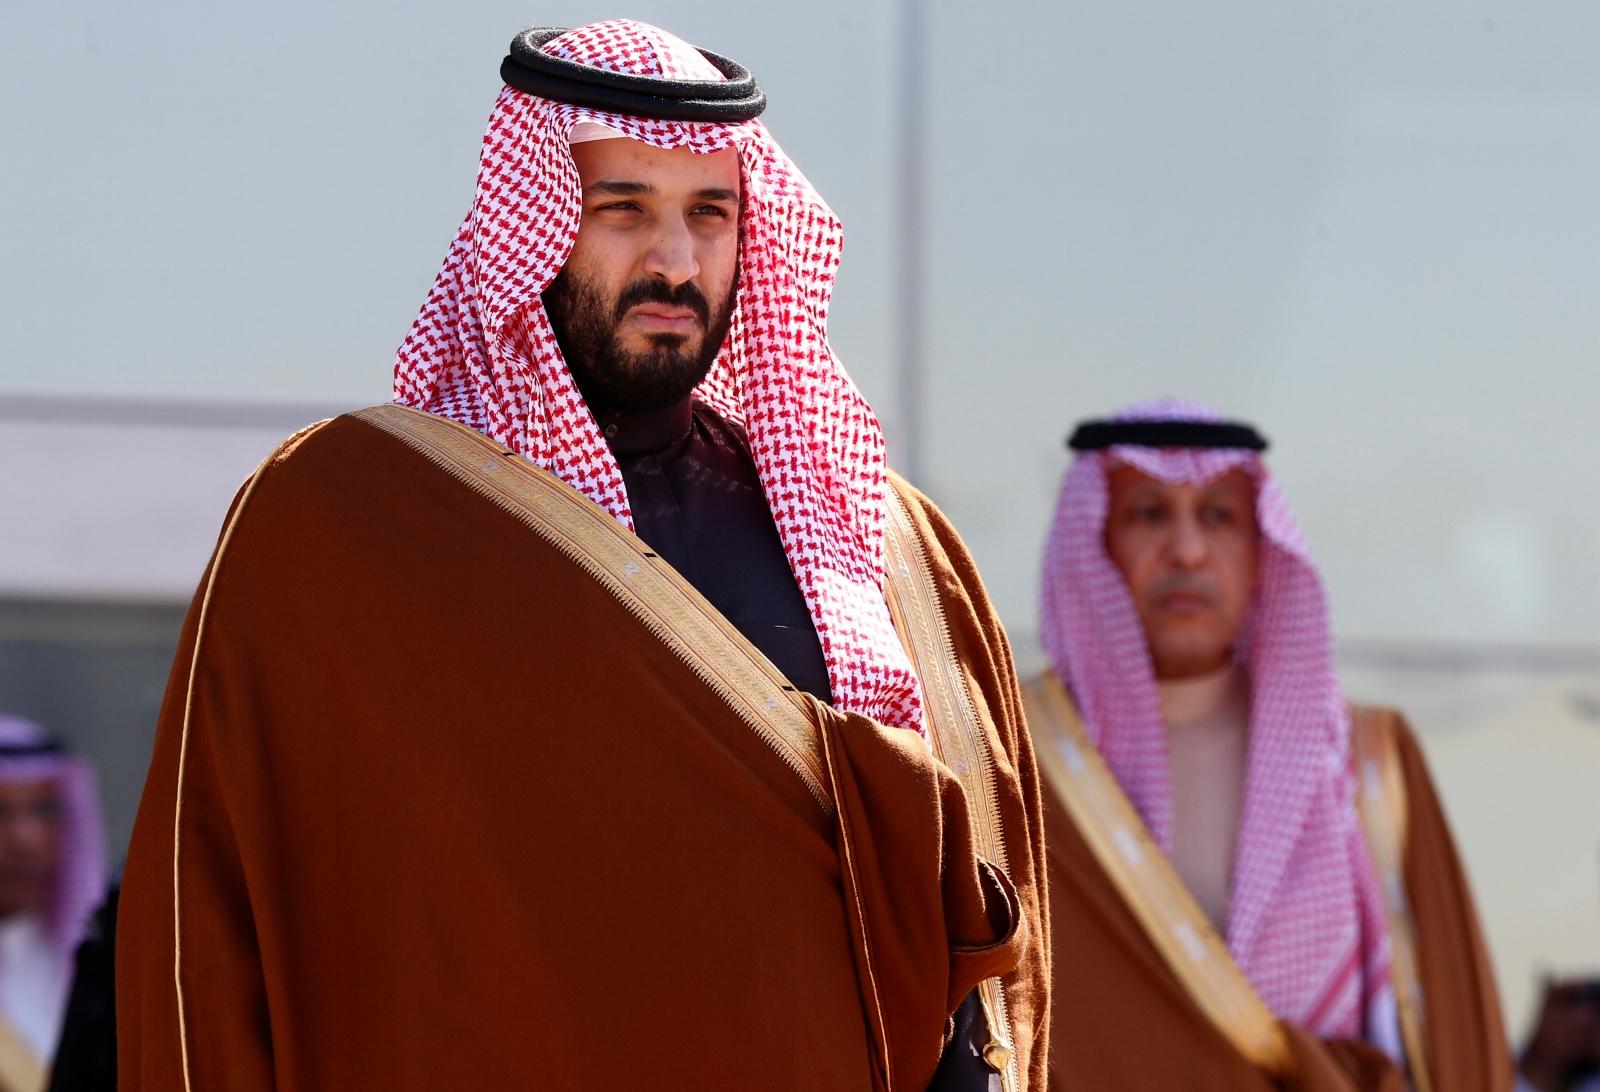 Deputy crown prince of Saudi Arabia